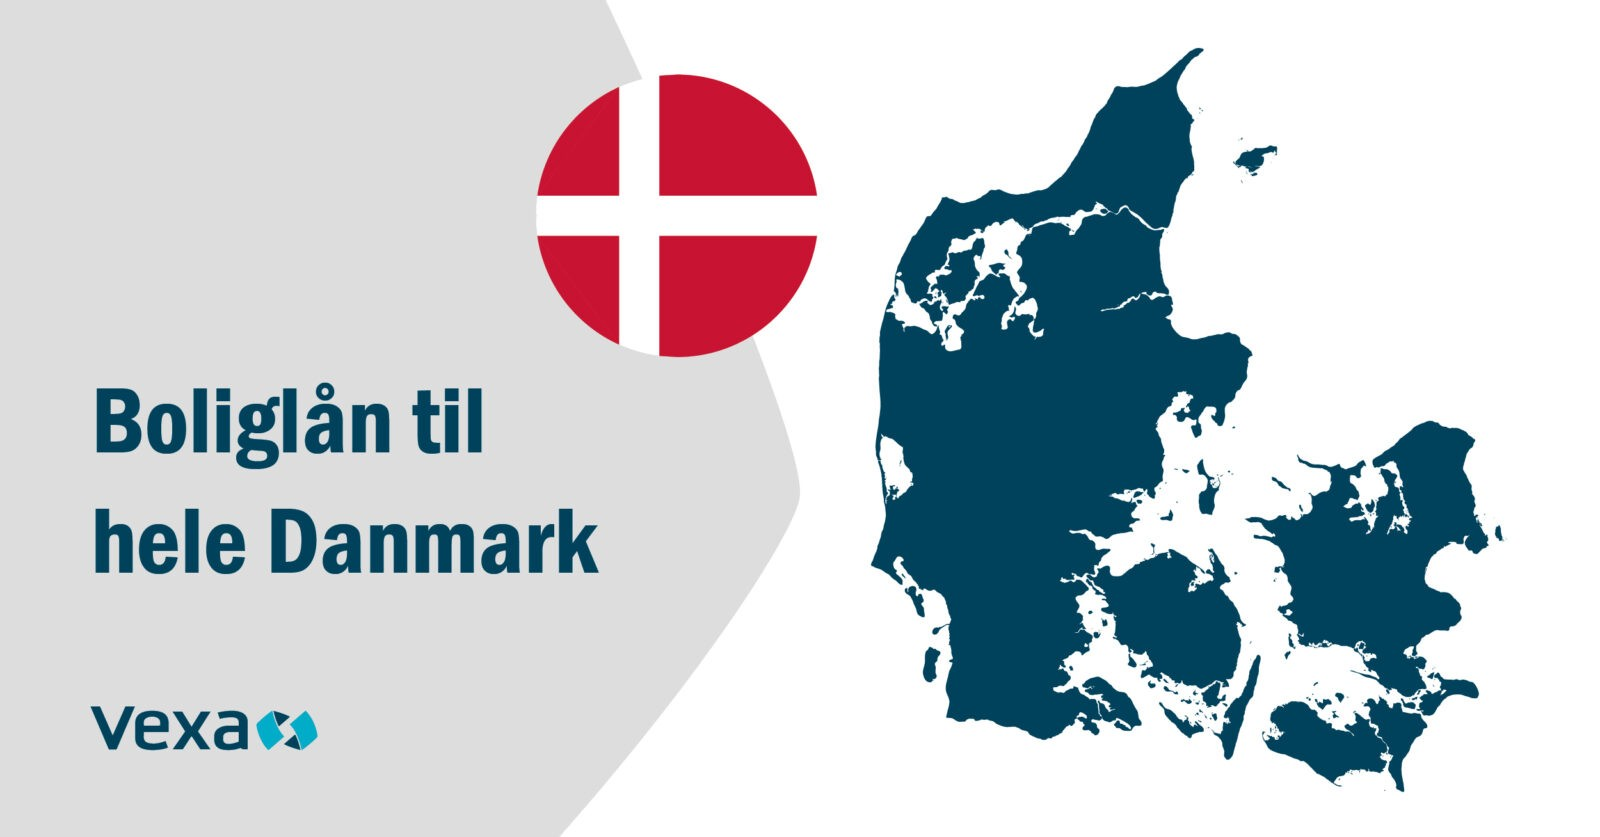 Boliglån til hele Danmark